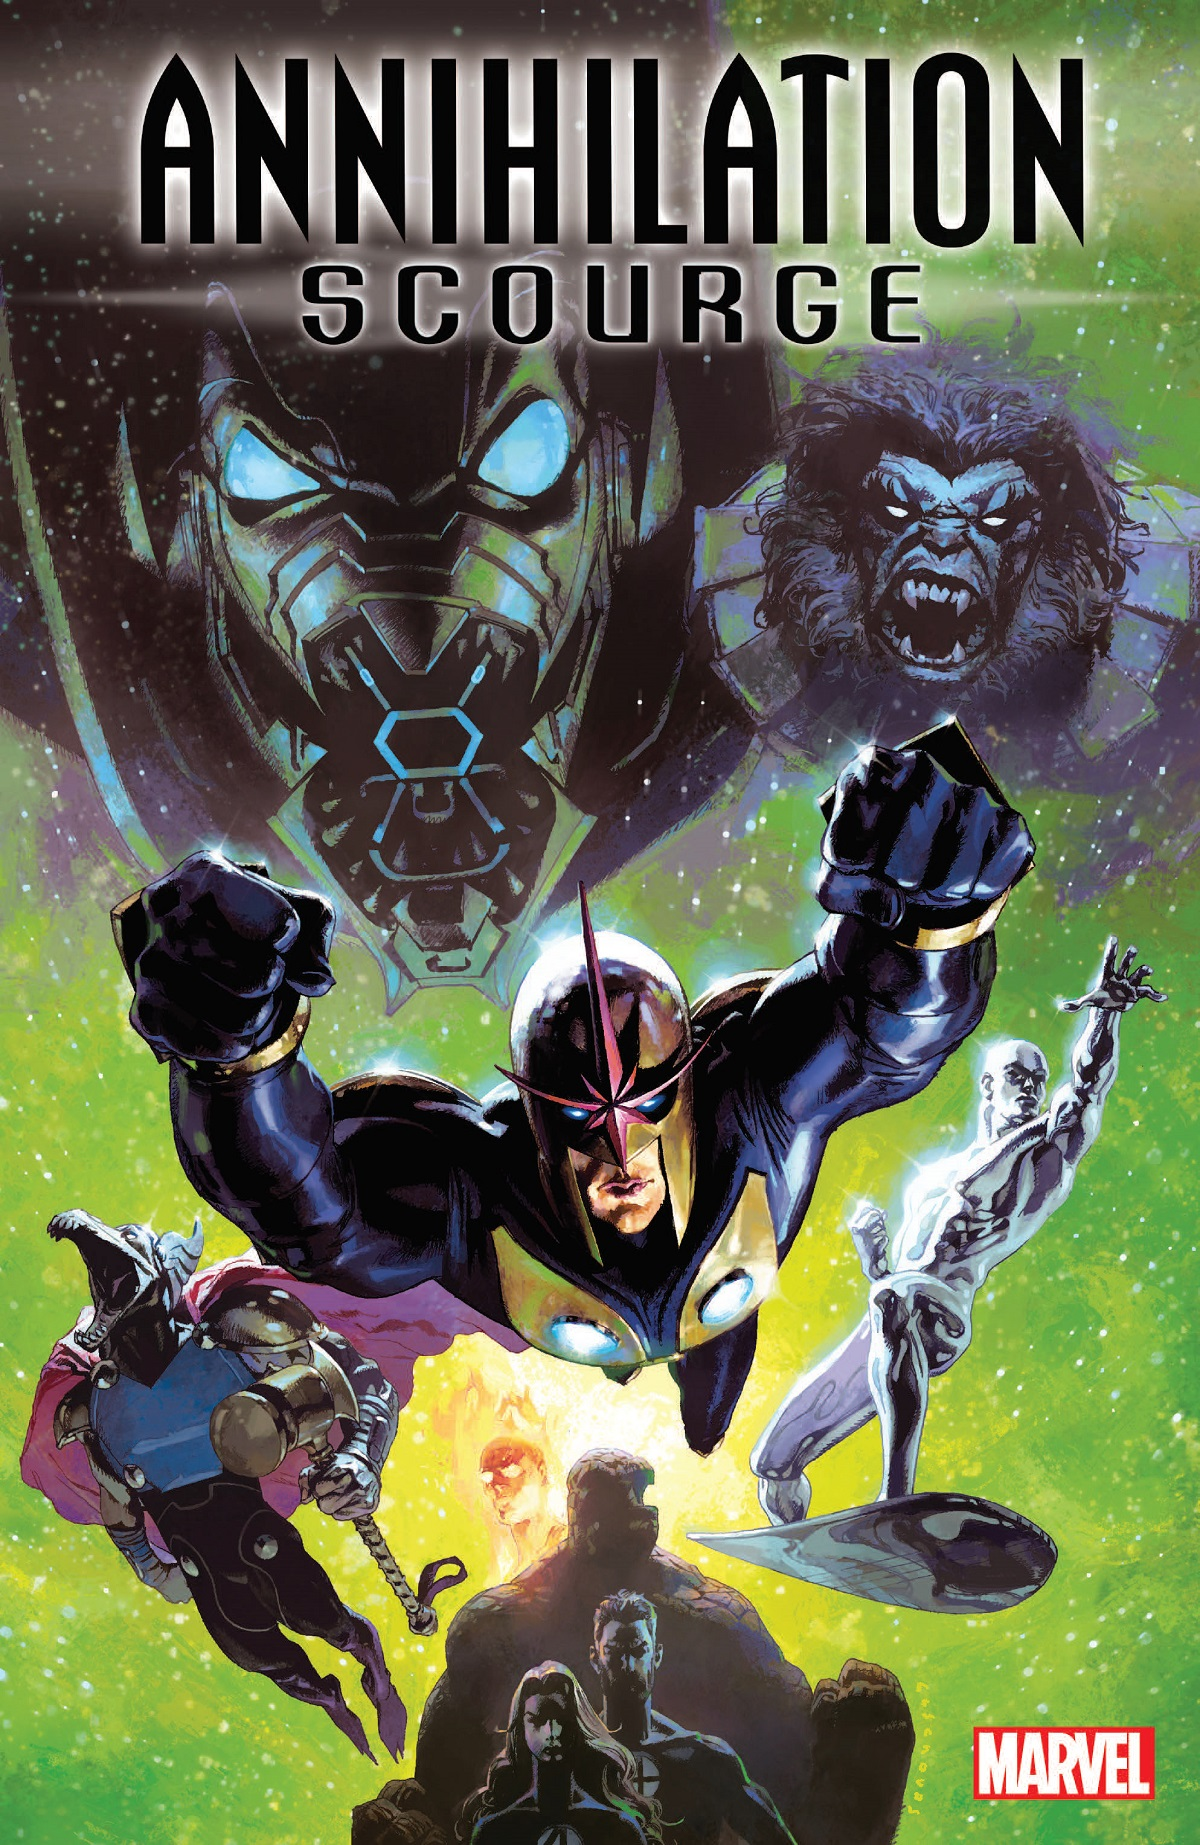 Annihilation: Scourge (Trade Paperback)